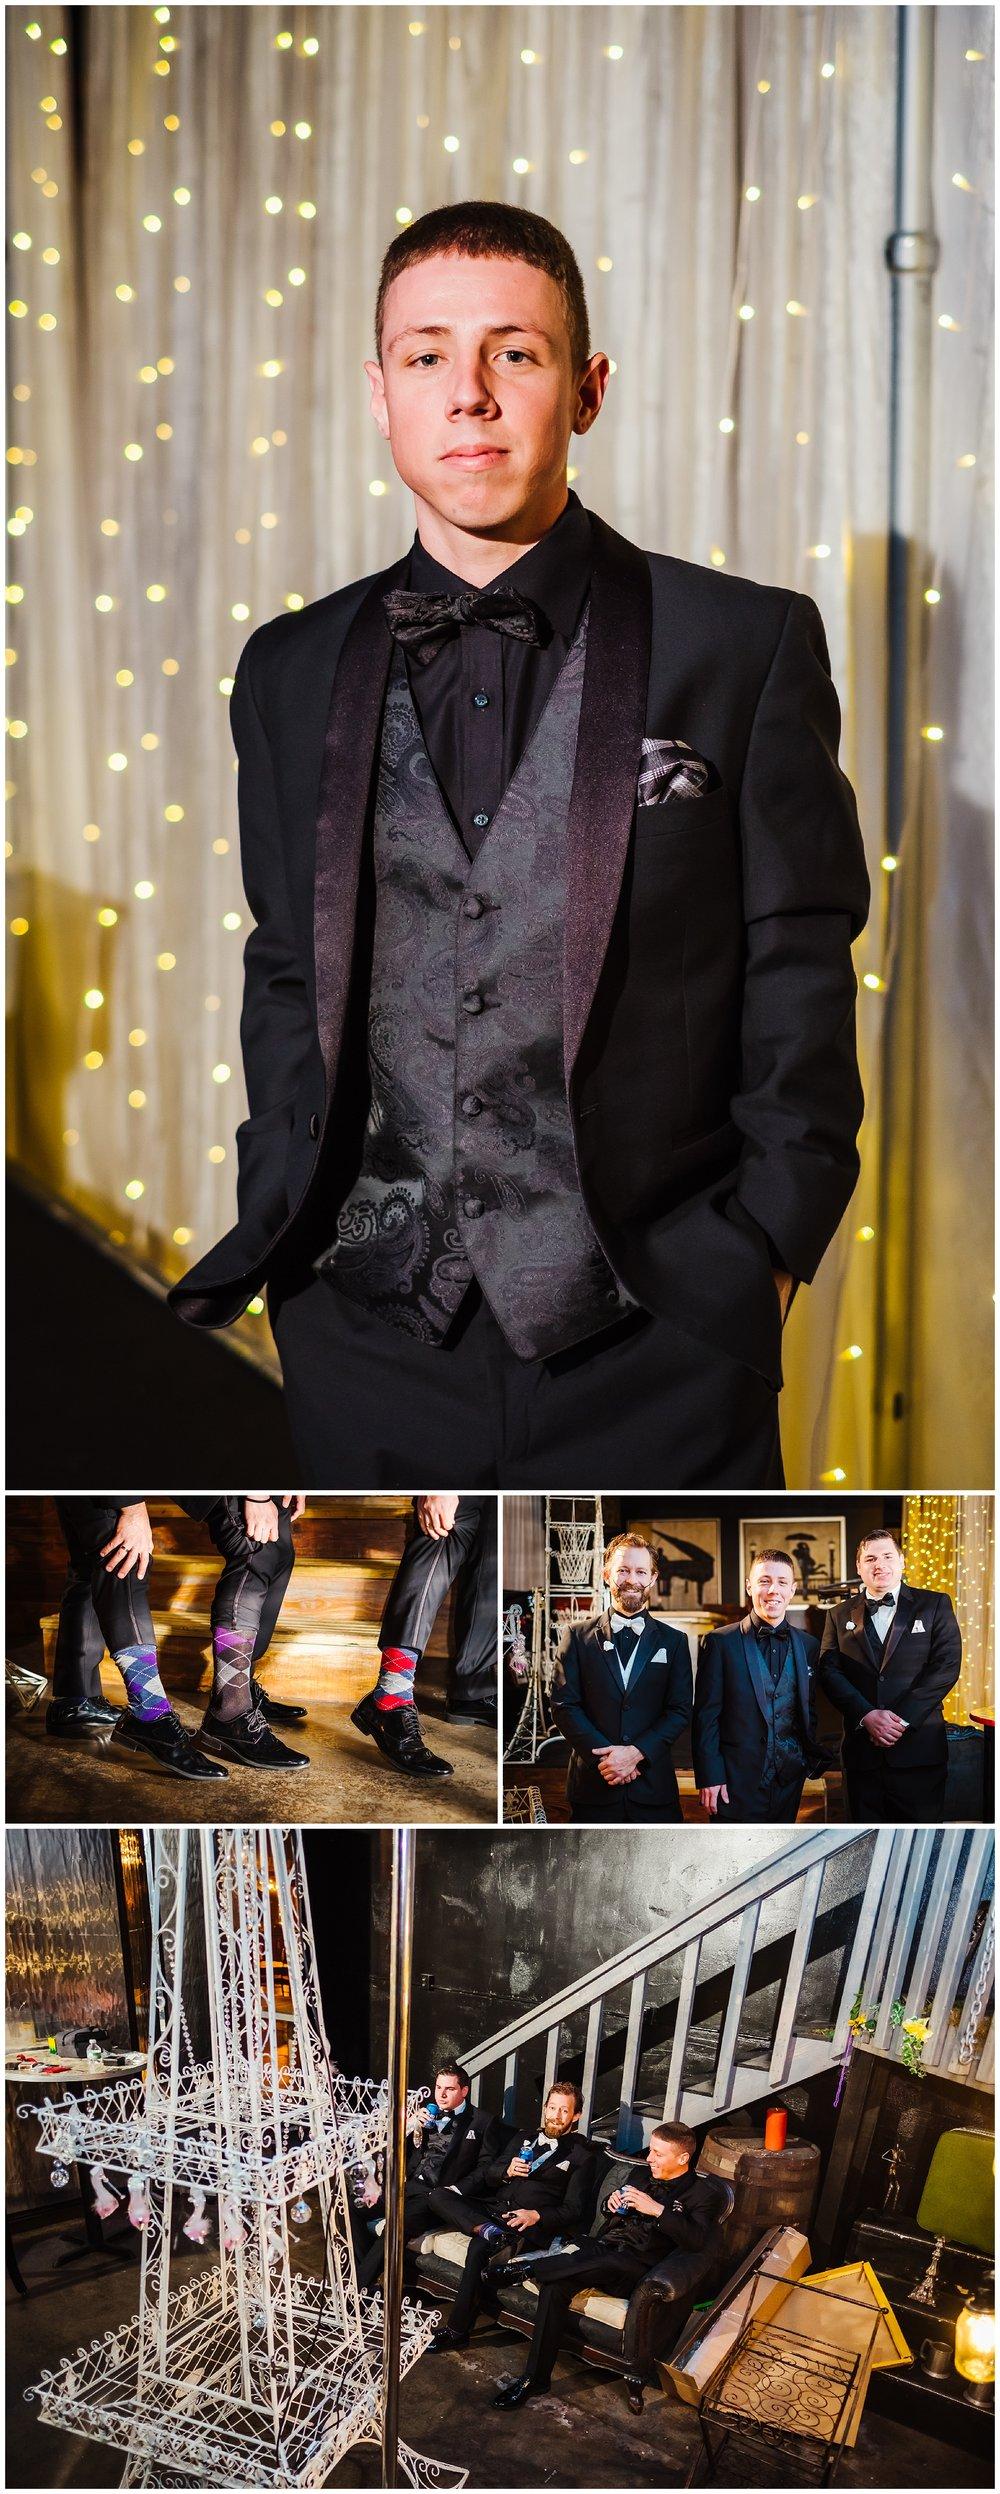 tampa-wedding-photographer-unique-indoor-venue_0006.jpg